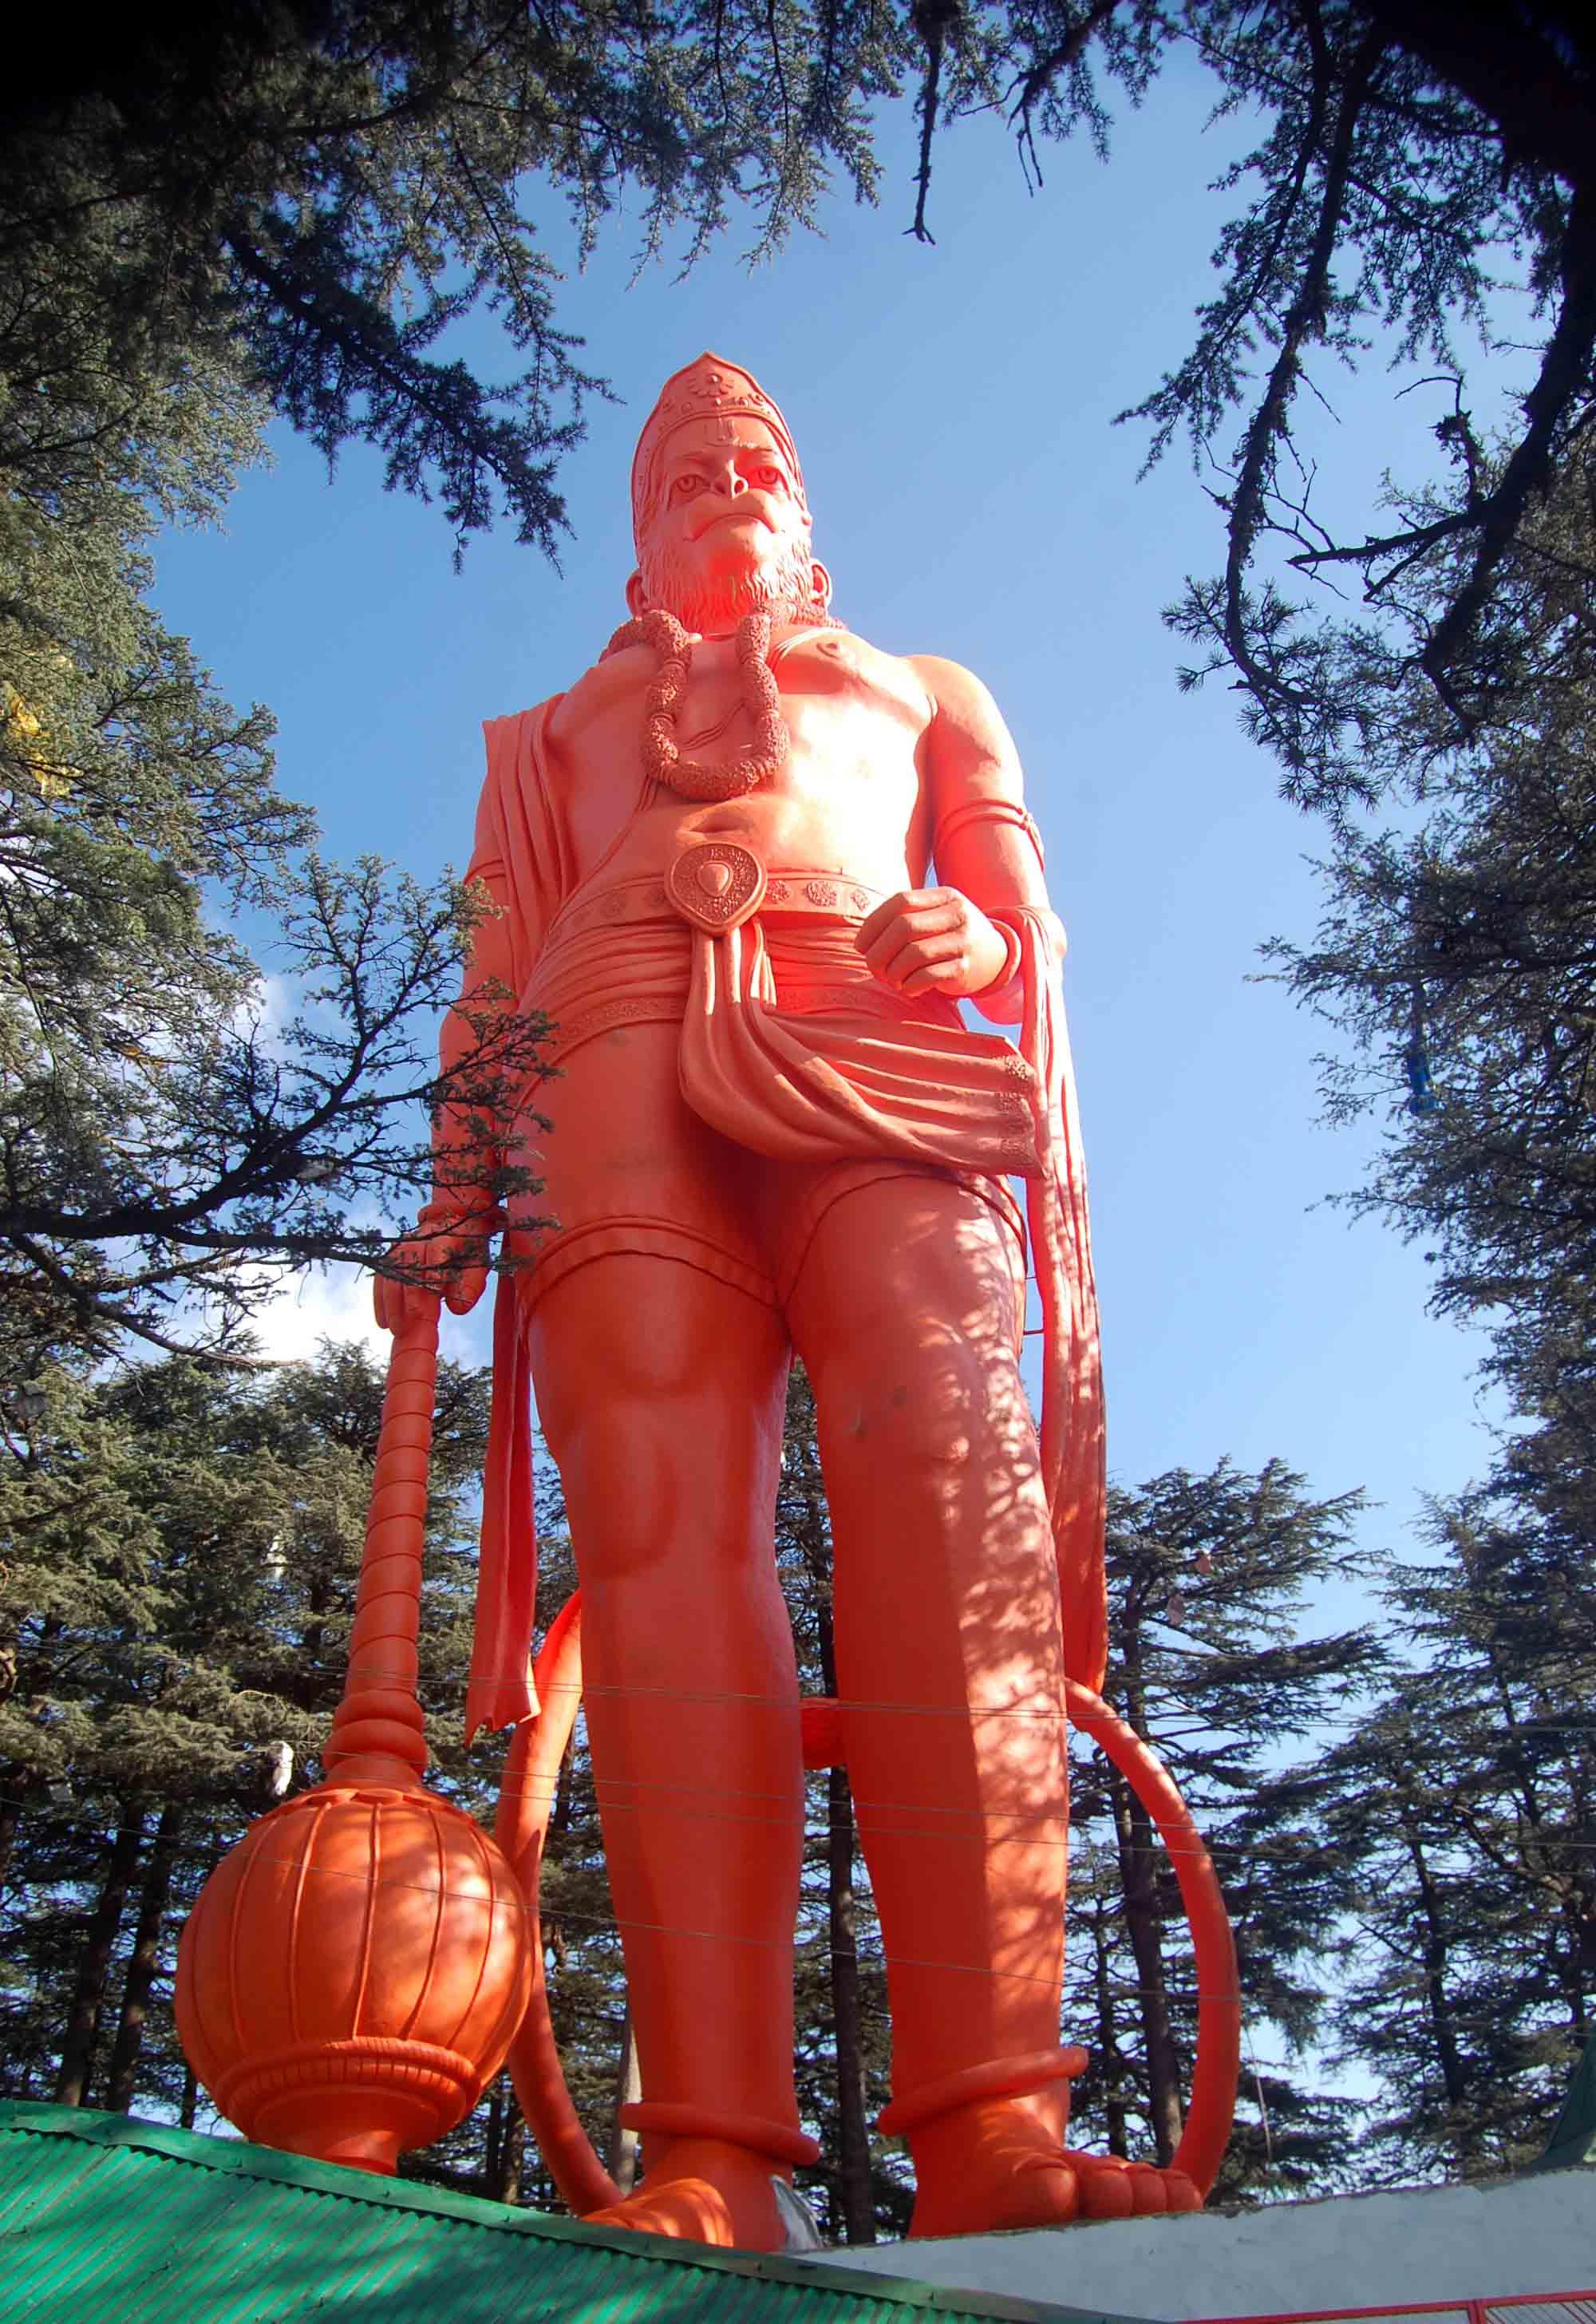 hanuman idol inshimla inaugrated by abhishek bacchan